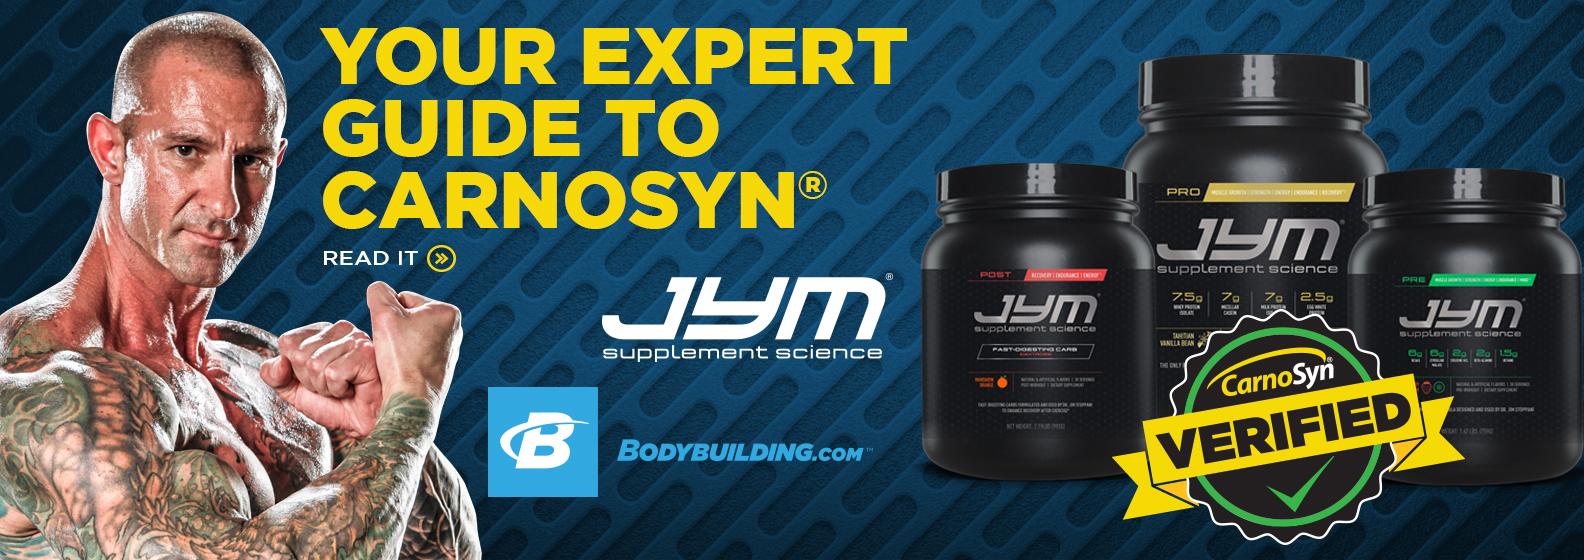 JYM Supplement Science on Bodybuilding